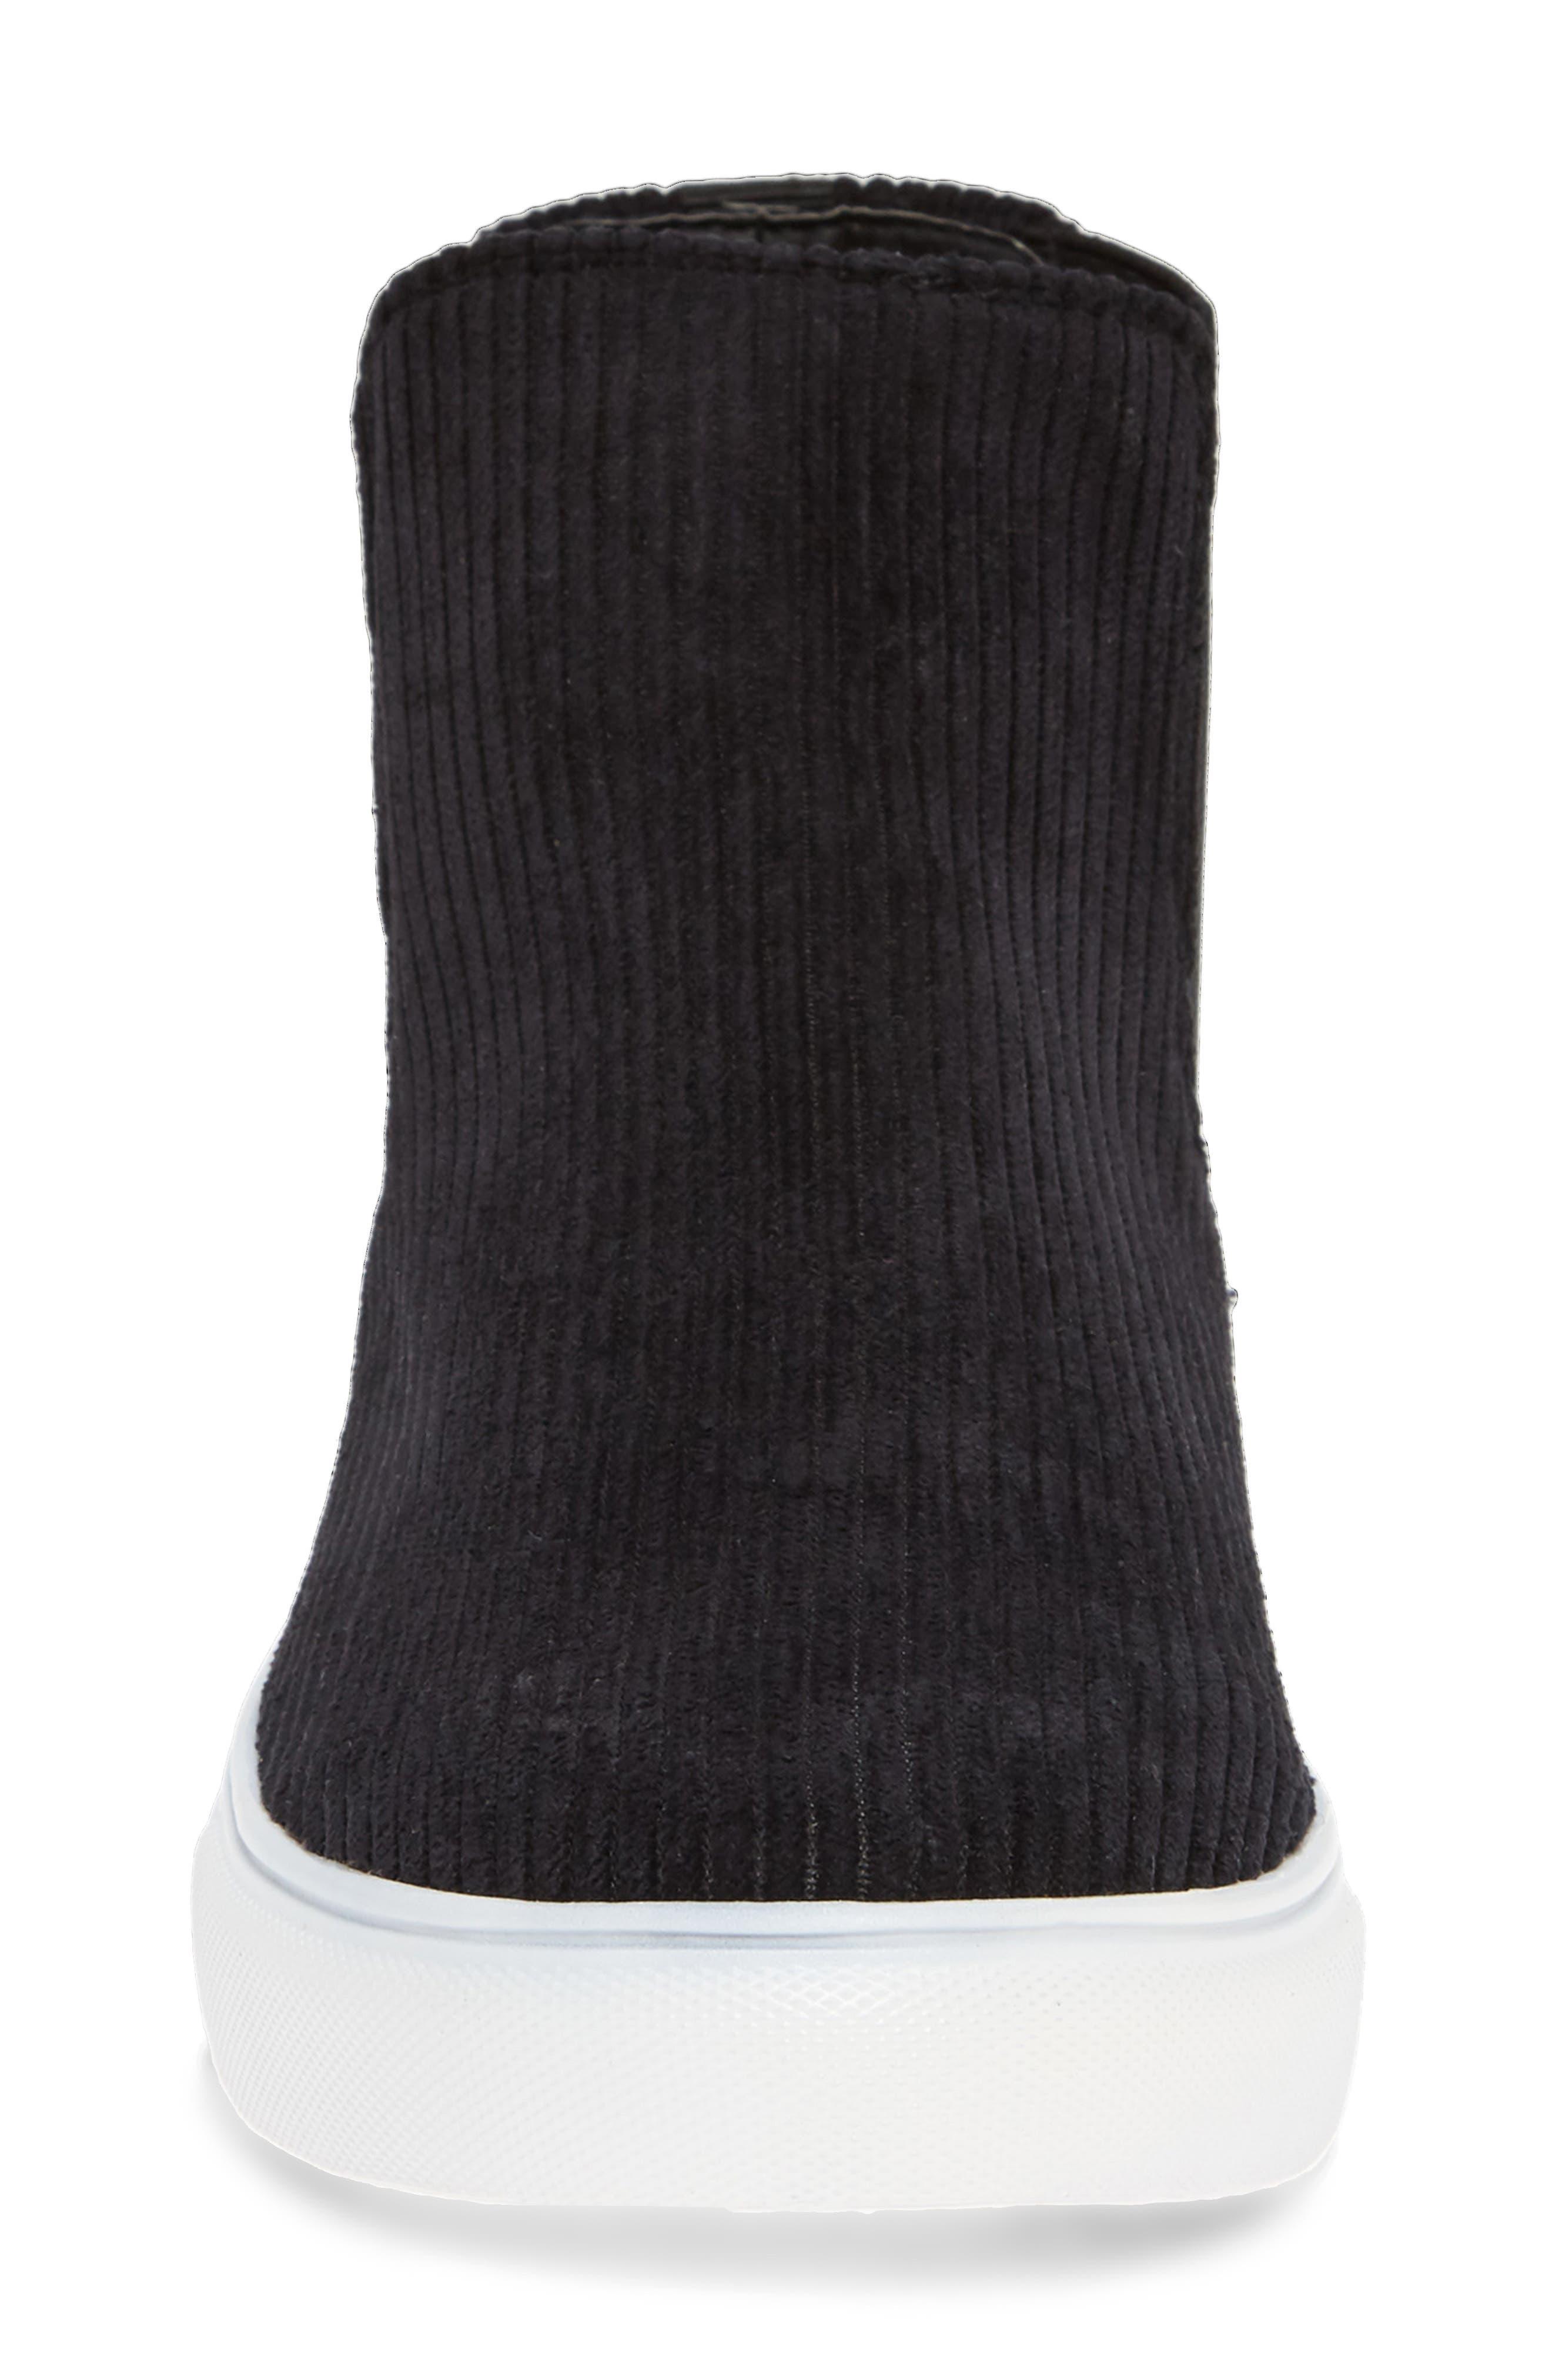 Stratford High Top Sneaker,                             Alternate thumbnail 4, color,                             BLACK FABRIC